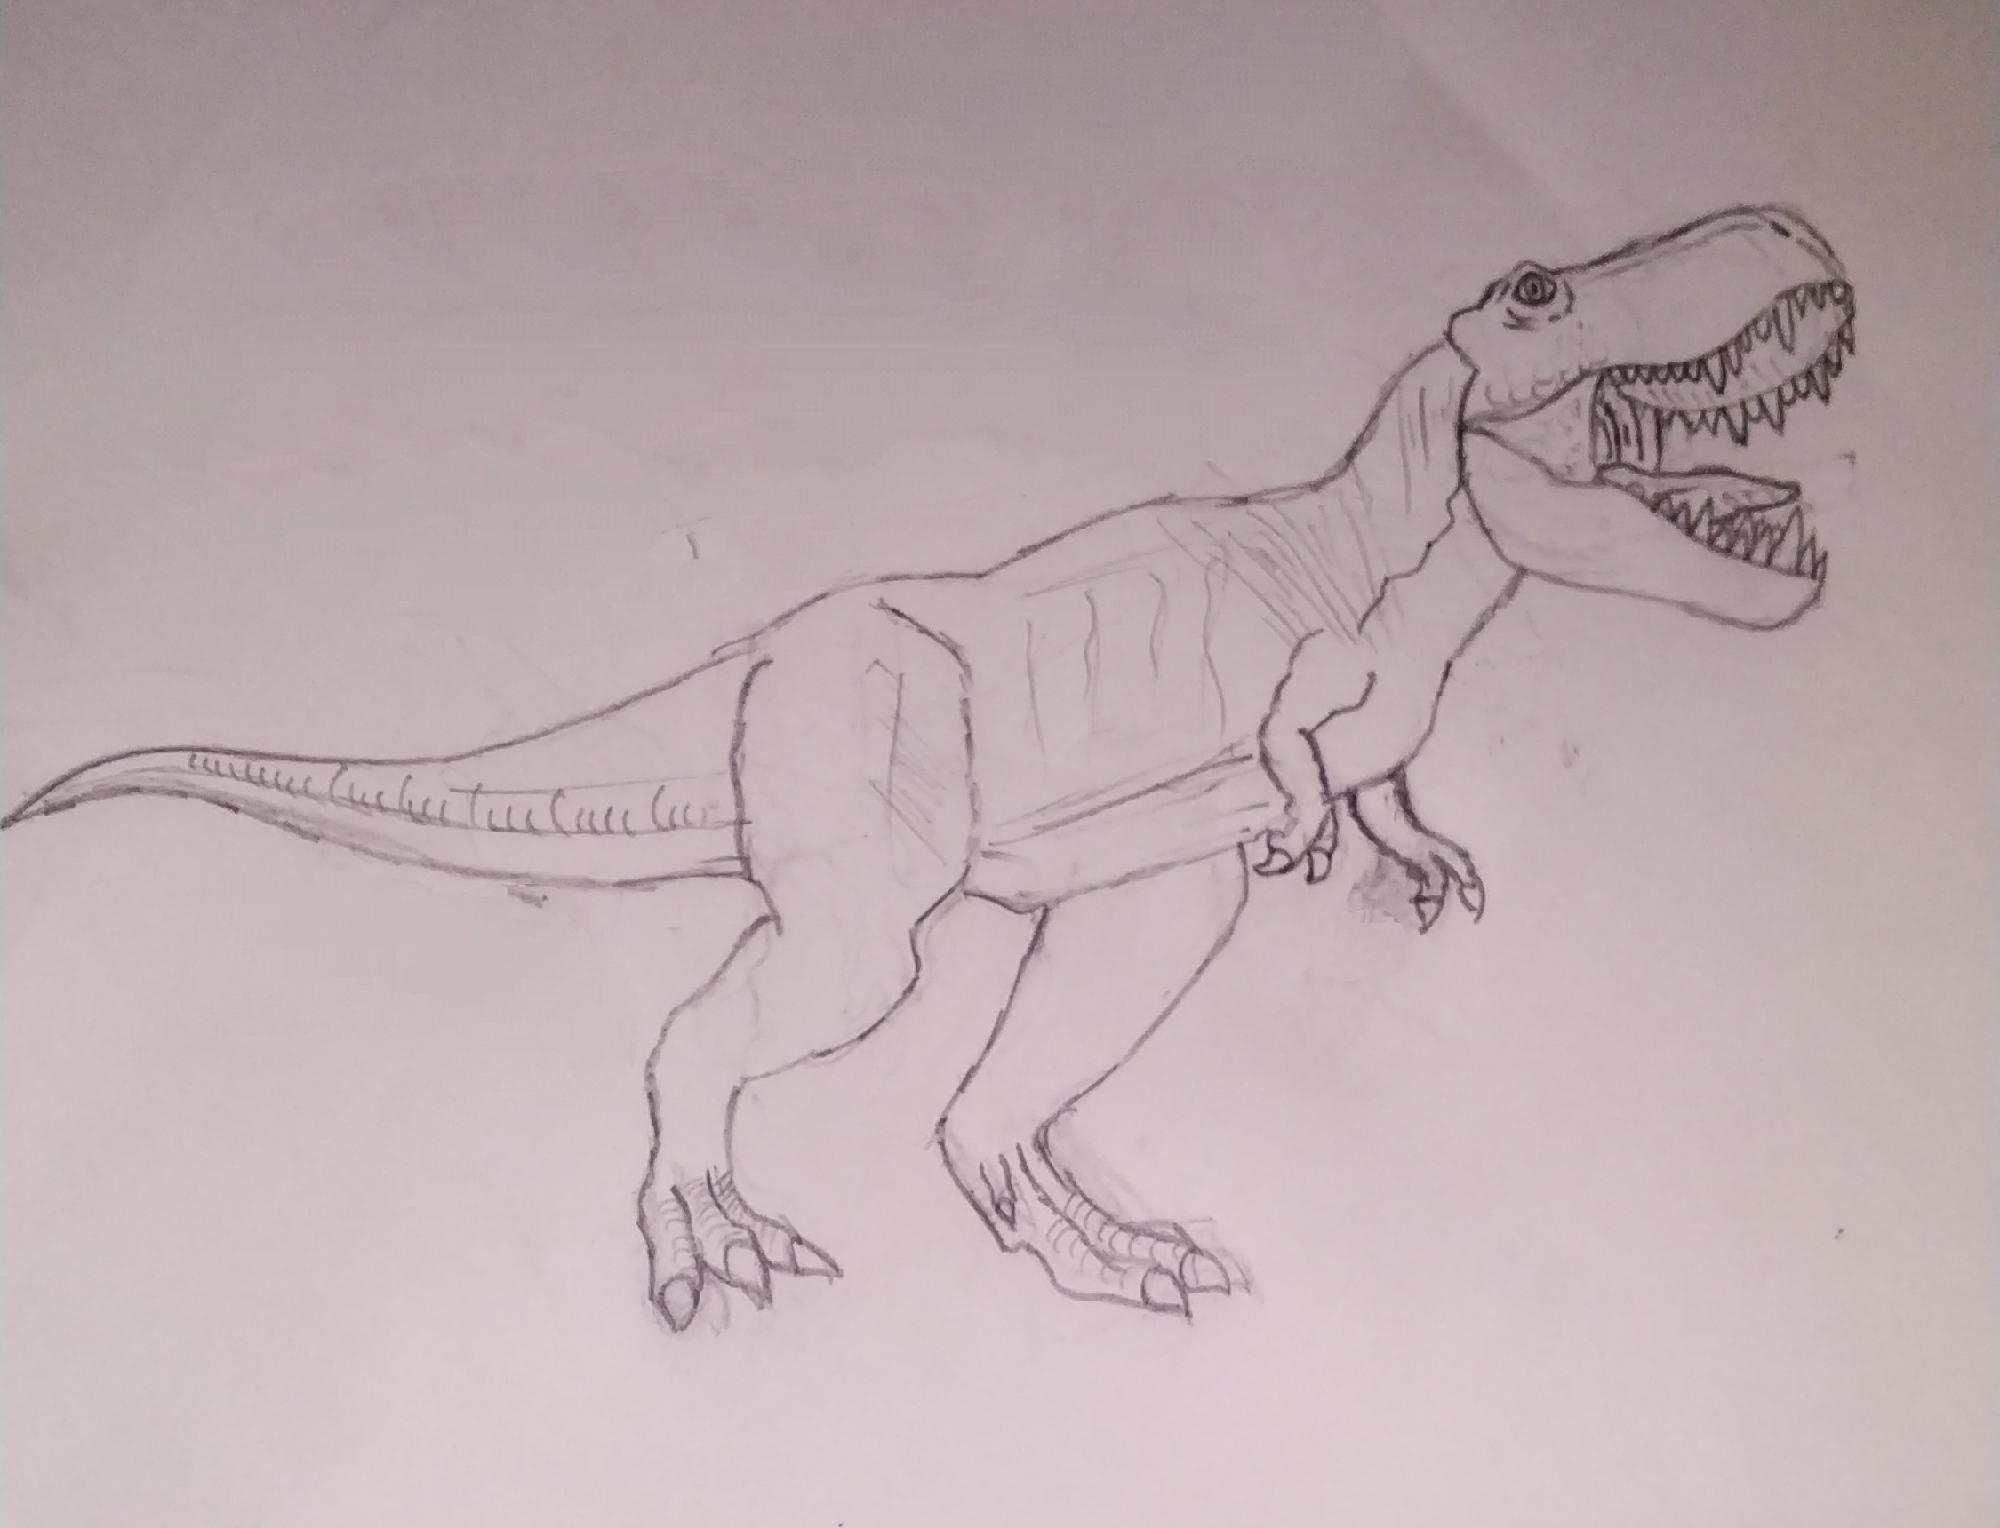 The tyrant lizard